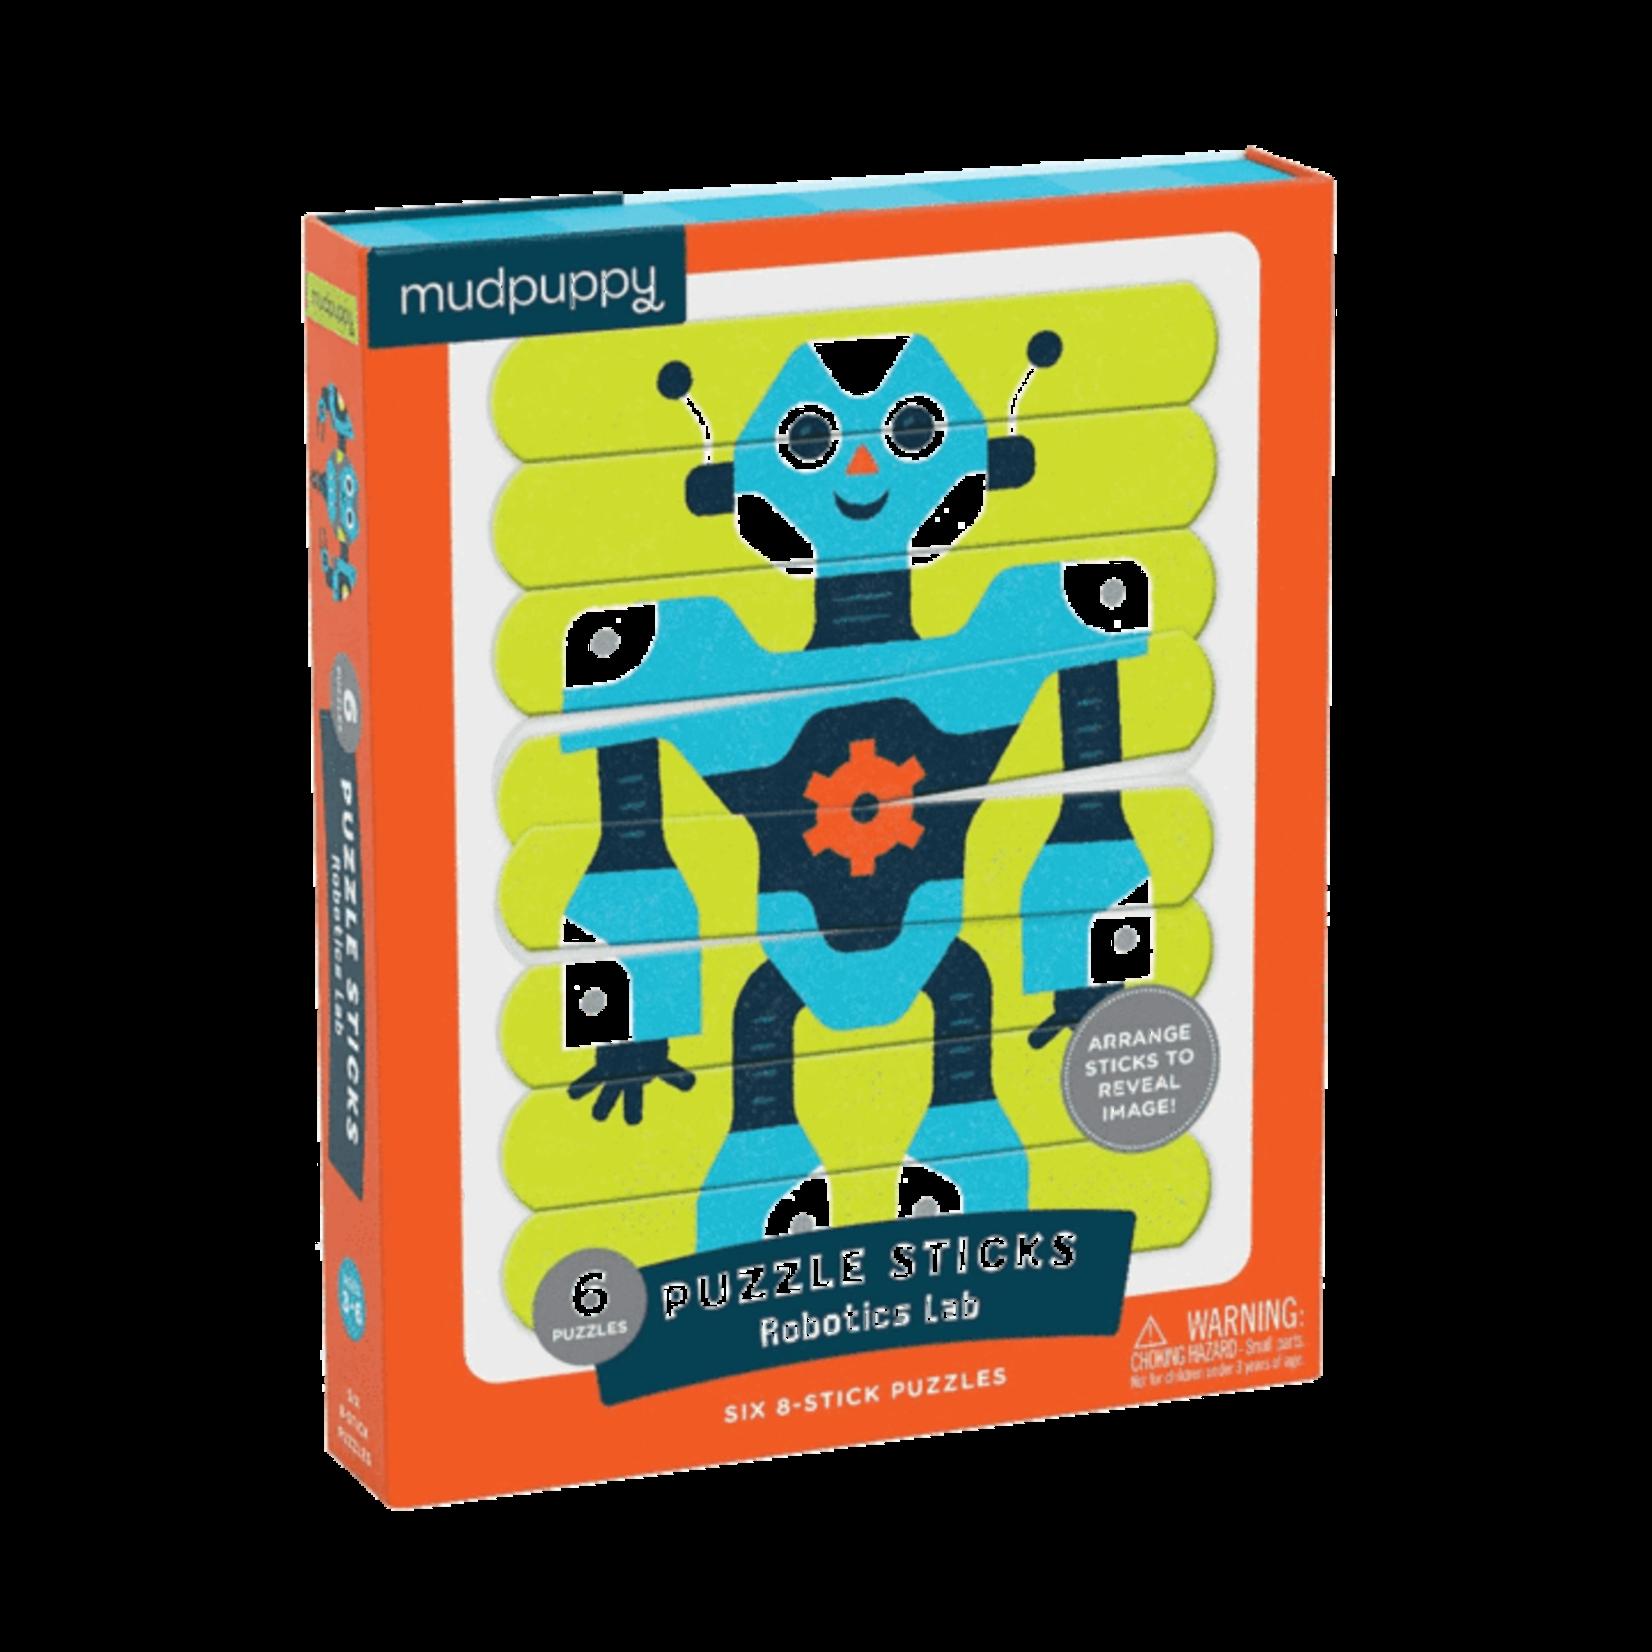 Mudpuppy Robotics Lab Puzzle Sticks 6 Pack 8pc